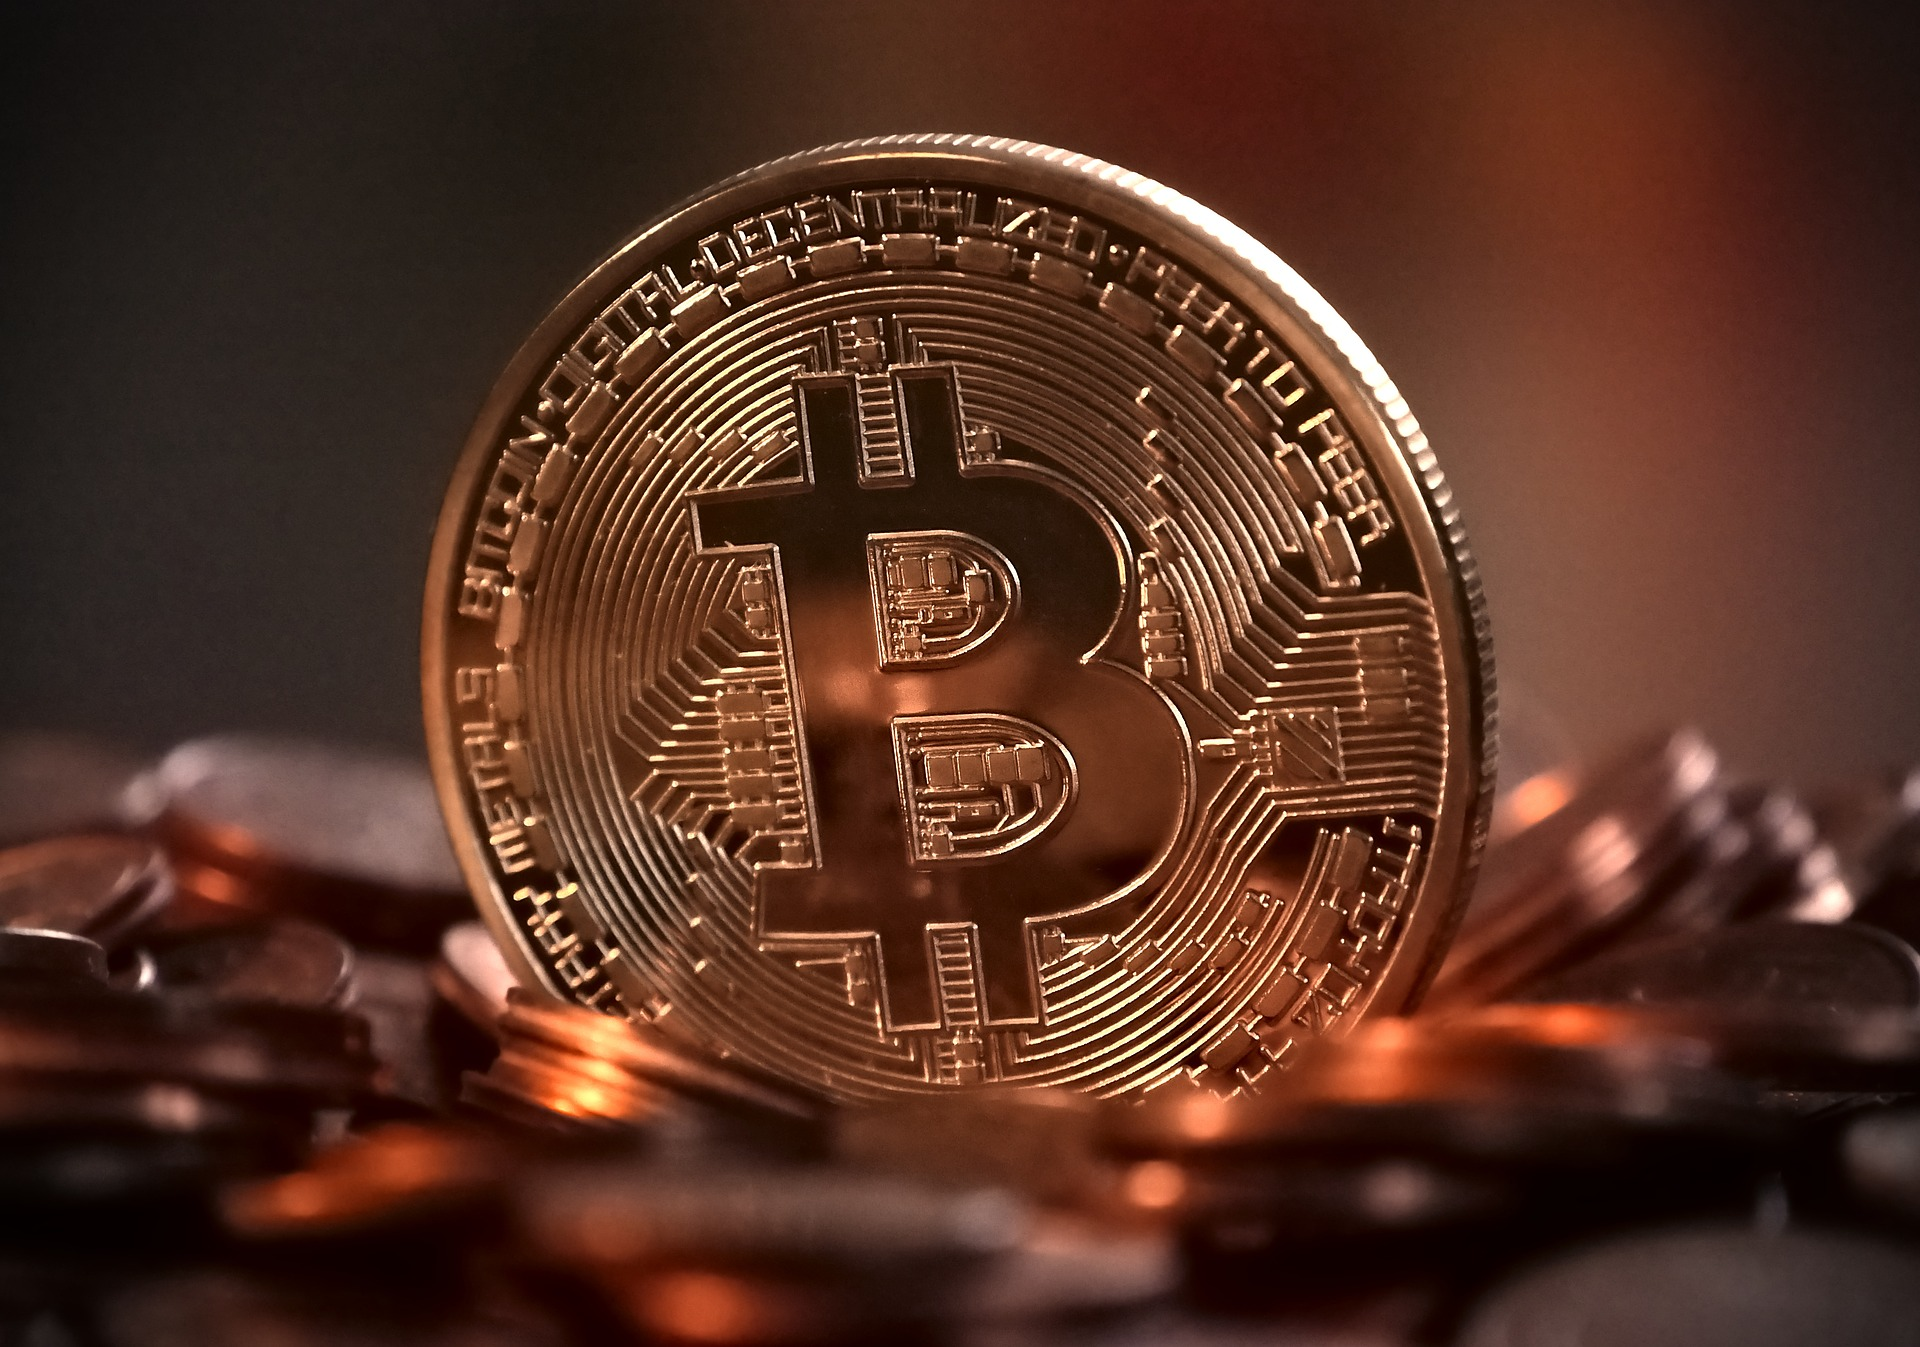 U.S. Businessman still Missing Despite Payment of Large Bitcoin Ransom